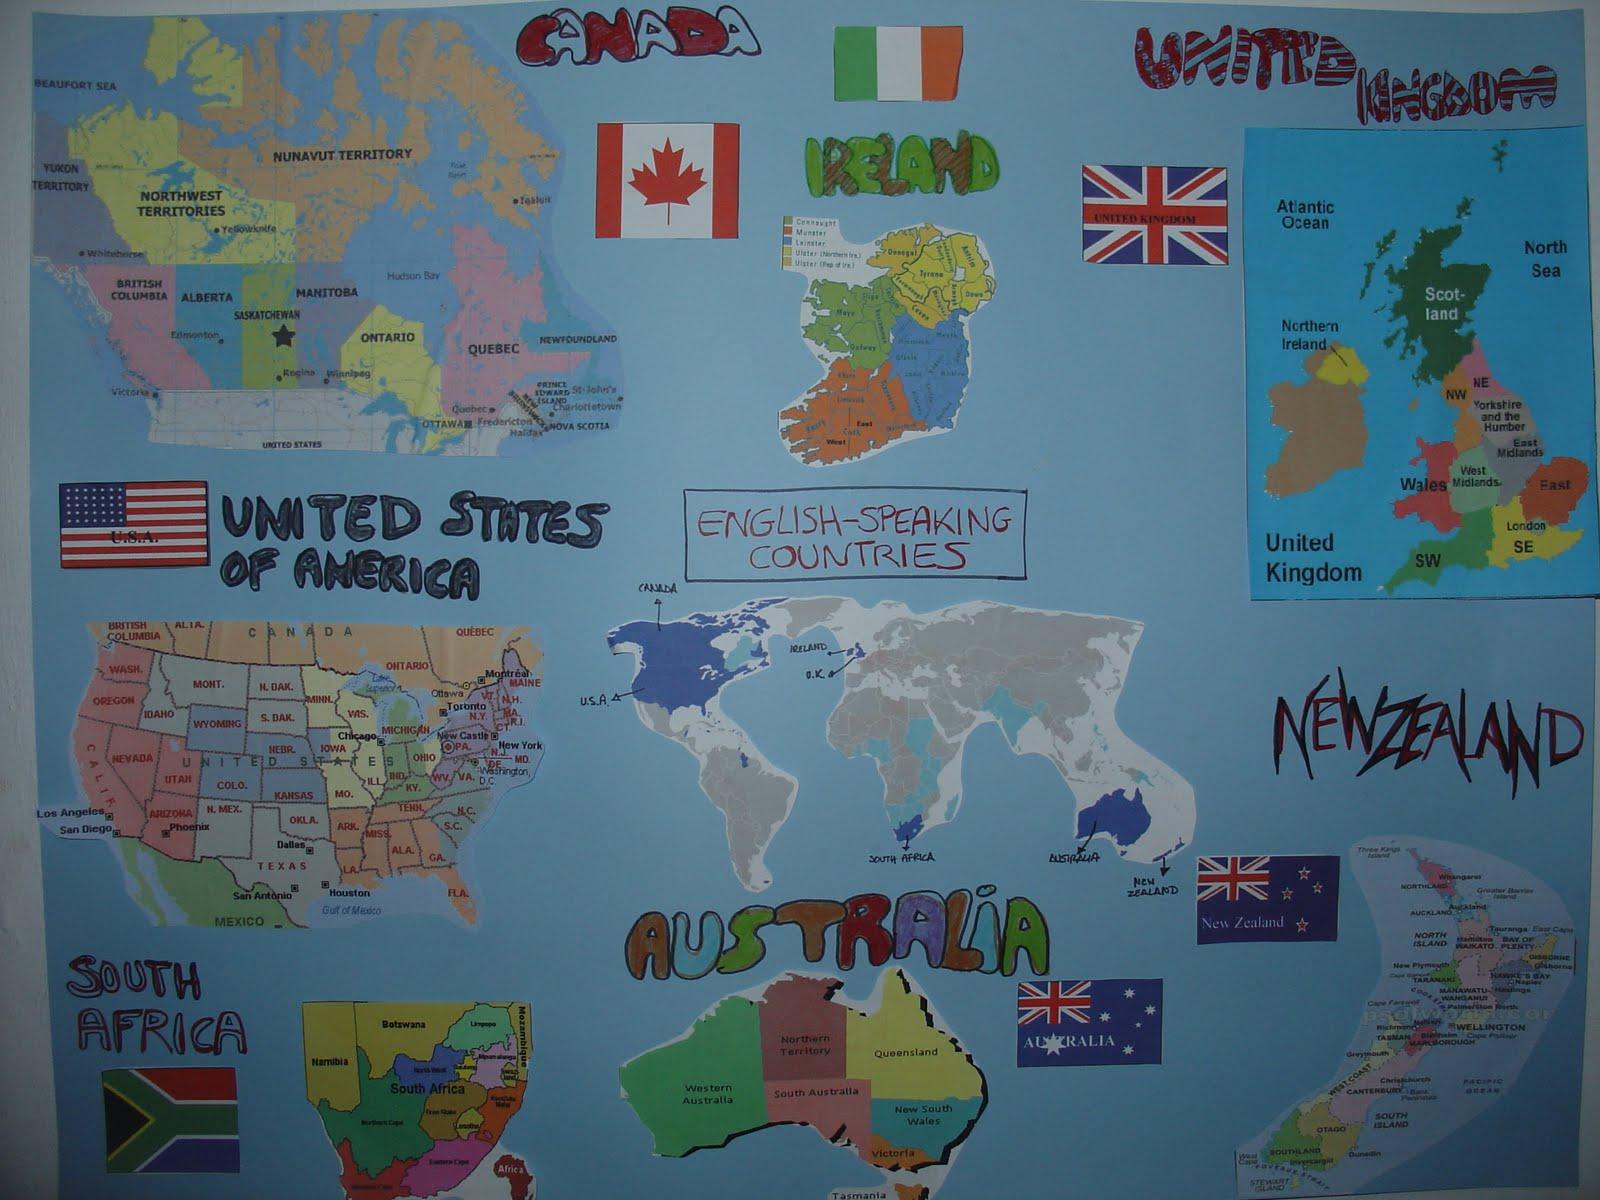 world language map dsc00098jpg 777b72b1ba6e26cb8493d877272c043b